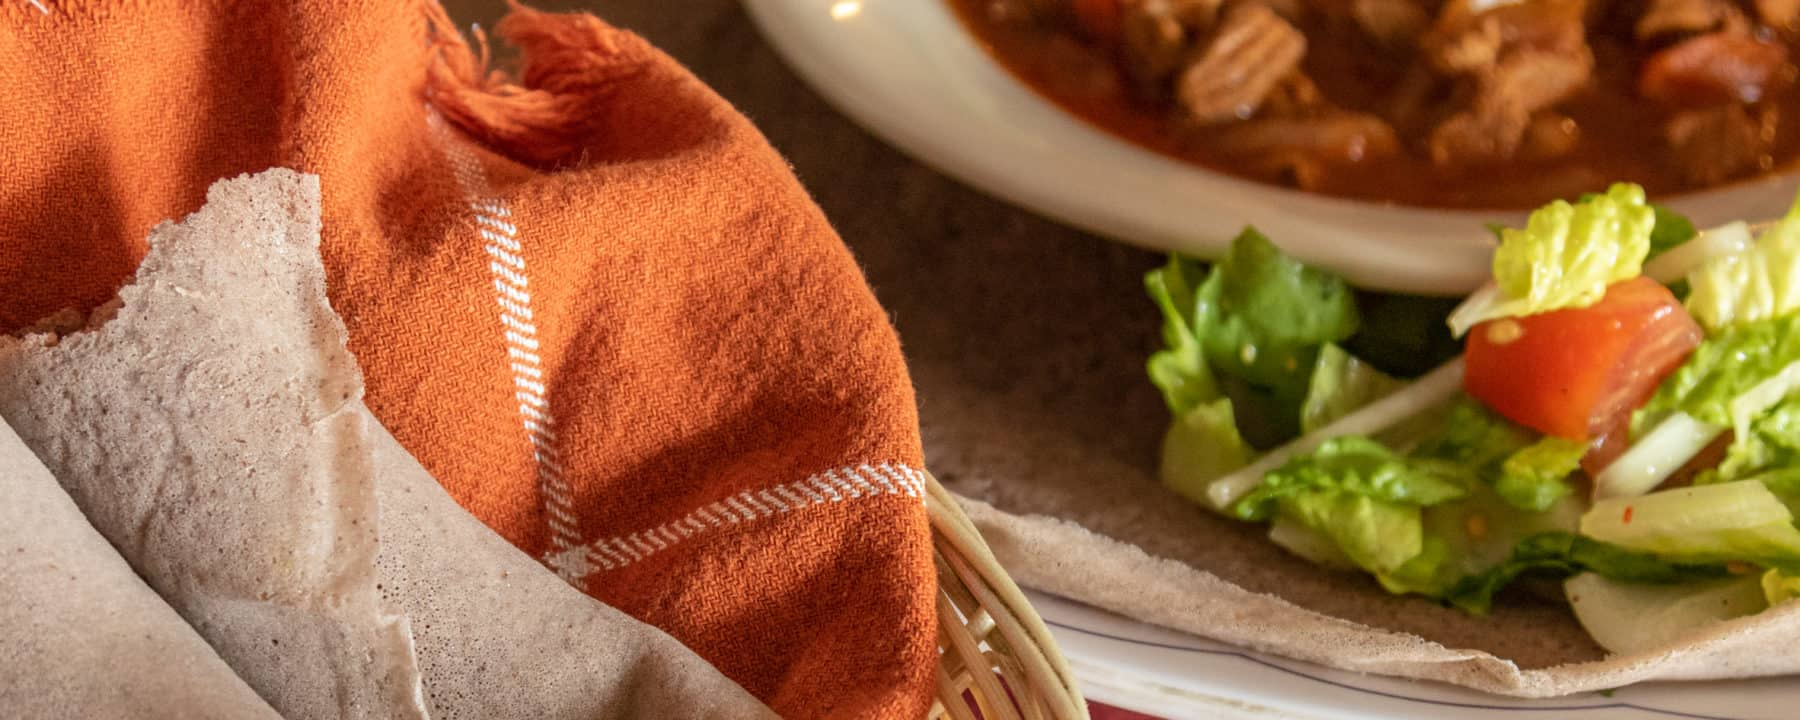 Injera lamb at Abyssinia restaurant in Anaheim, California.